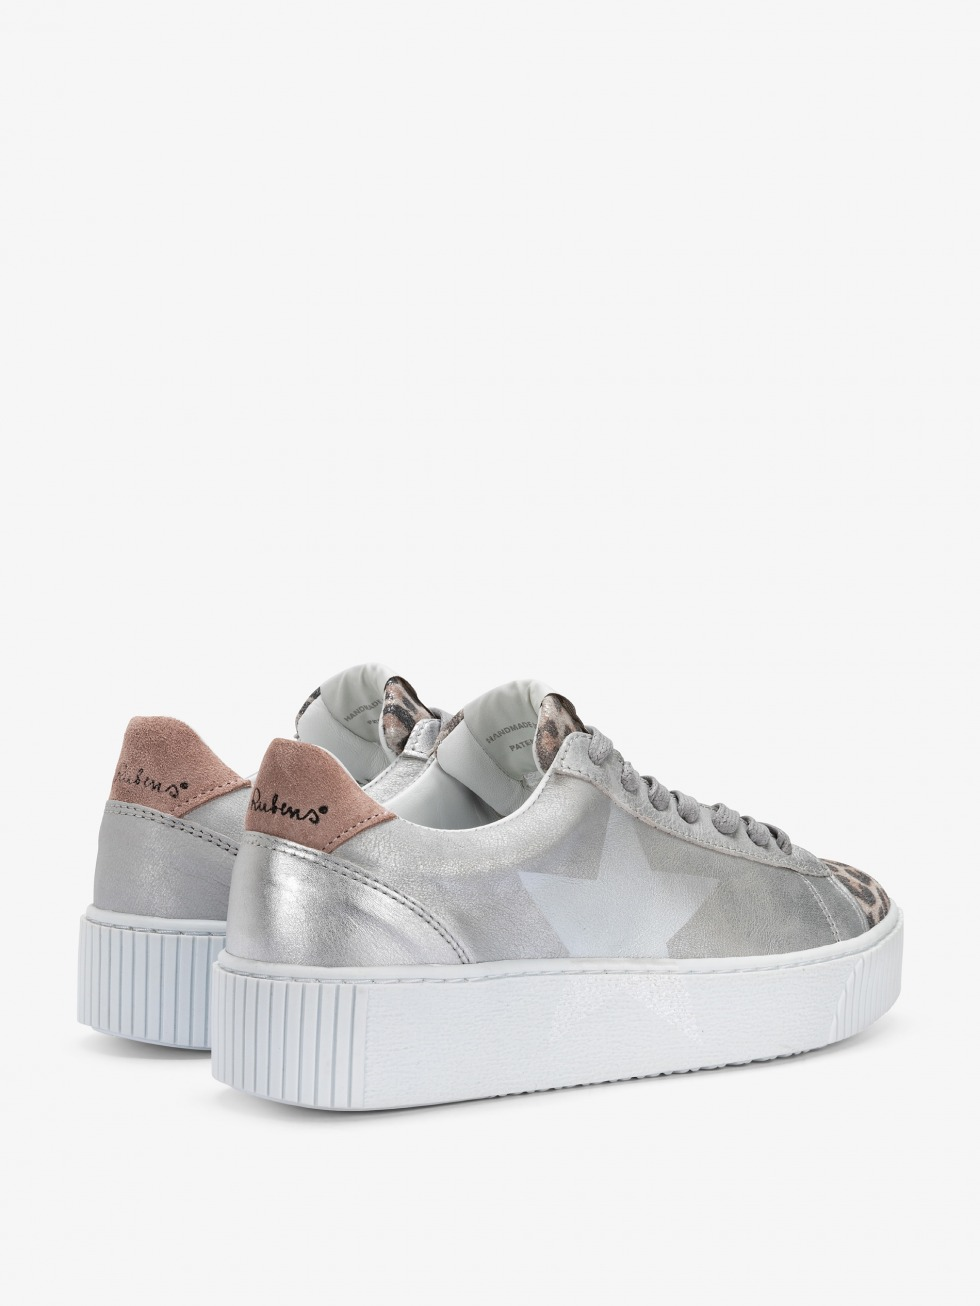 Cosmopolitan Pink Leo Sneakers - Star